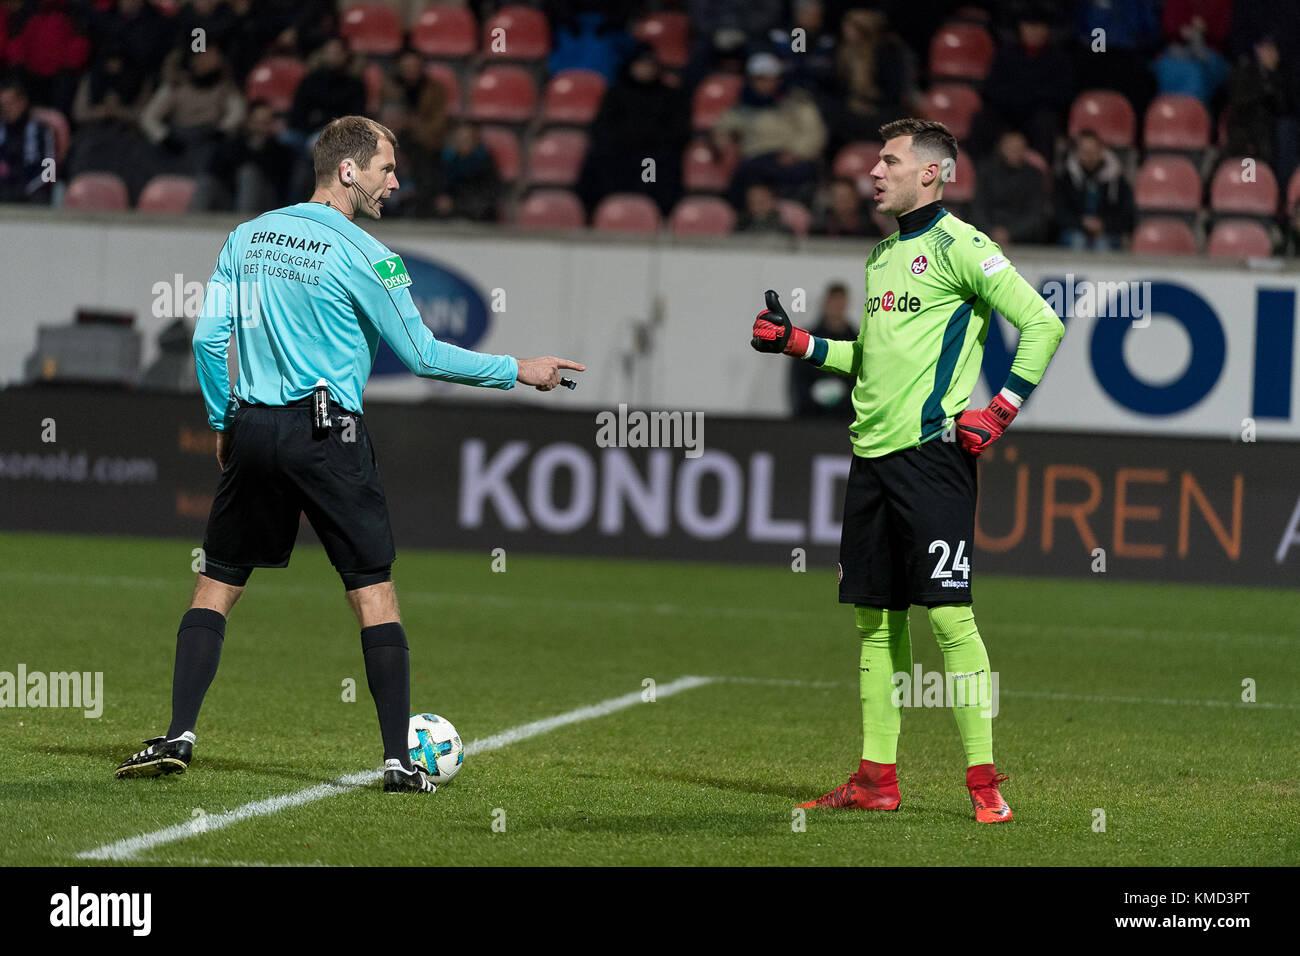 Marius Mueller, Torwart (1.FC Kaiserslautern #24), 1.FC Heidenheim 1846 vs 1.FC Kaiserslautern,  Herren, Fussball, - Stock Image